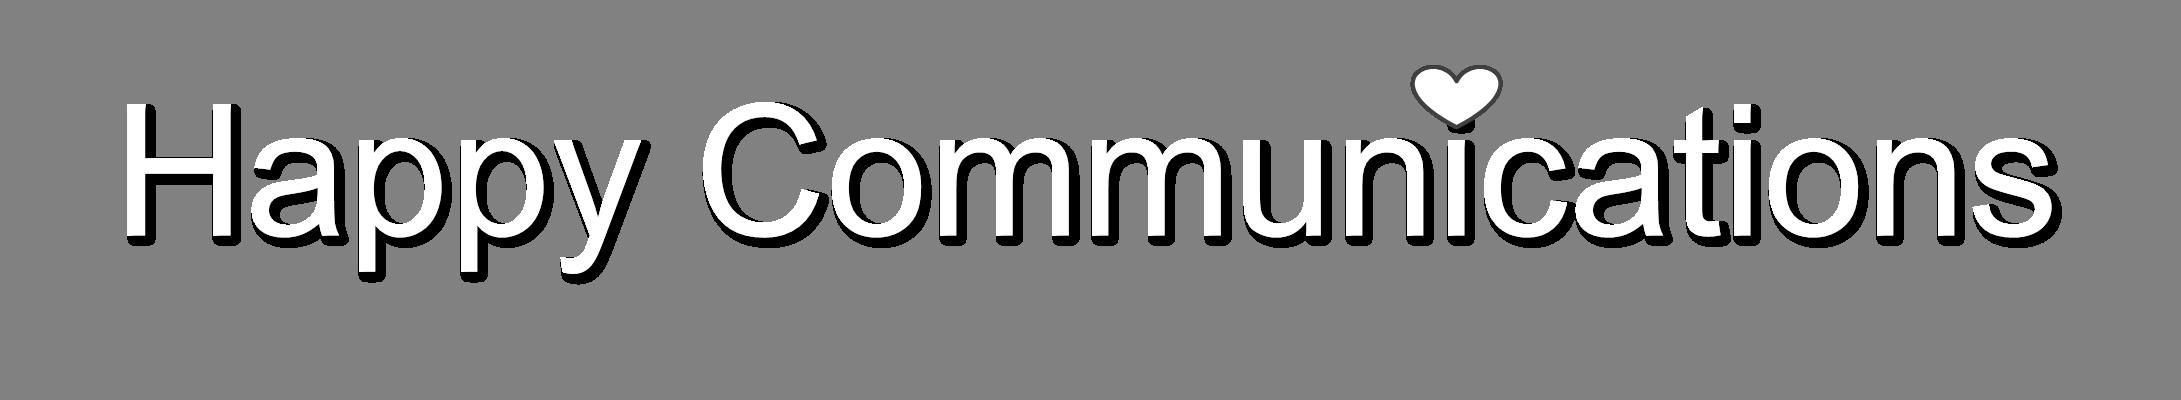 Happy Communications